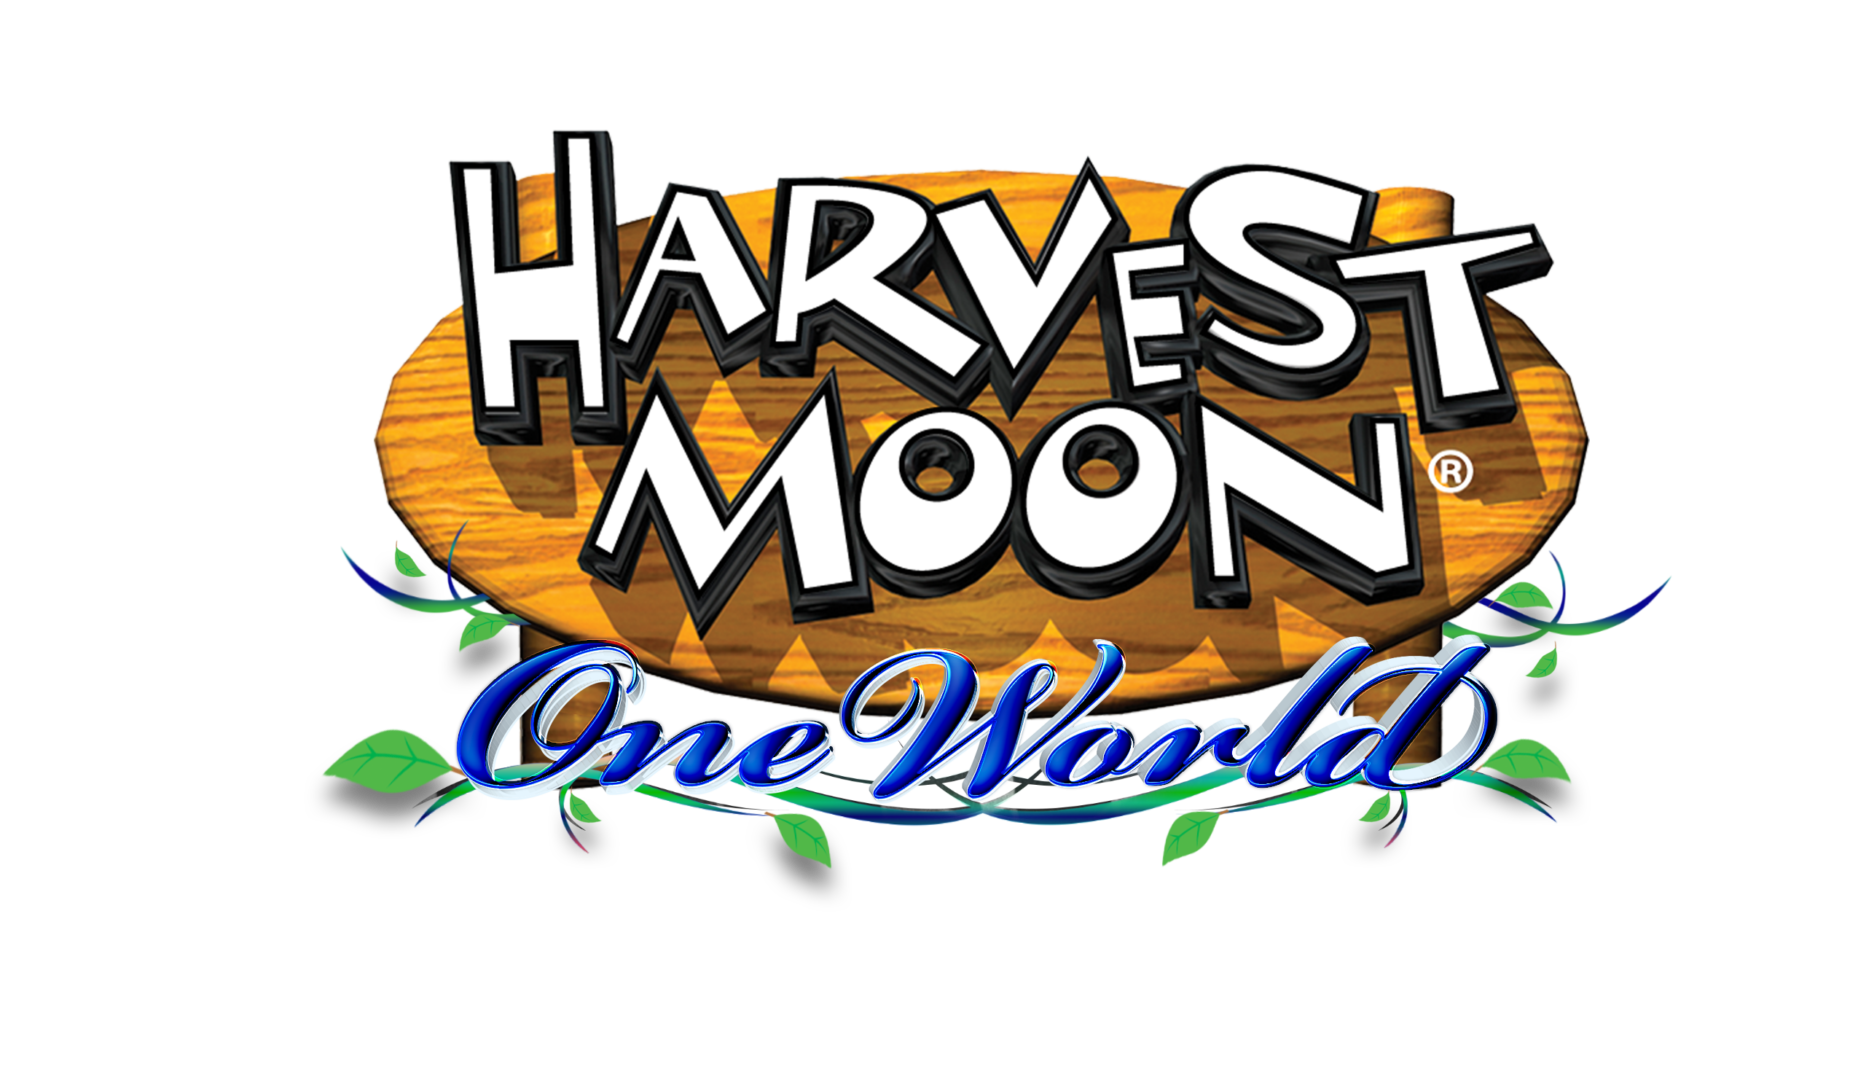 harvest moon, one world